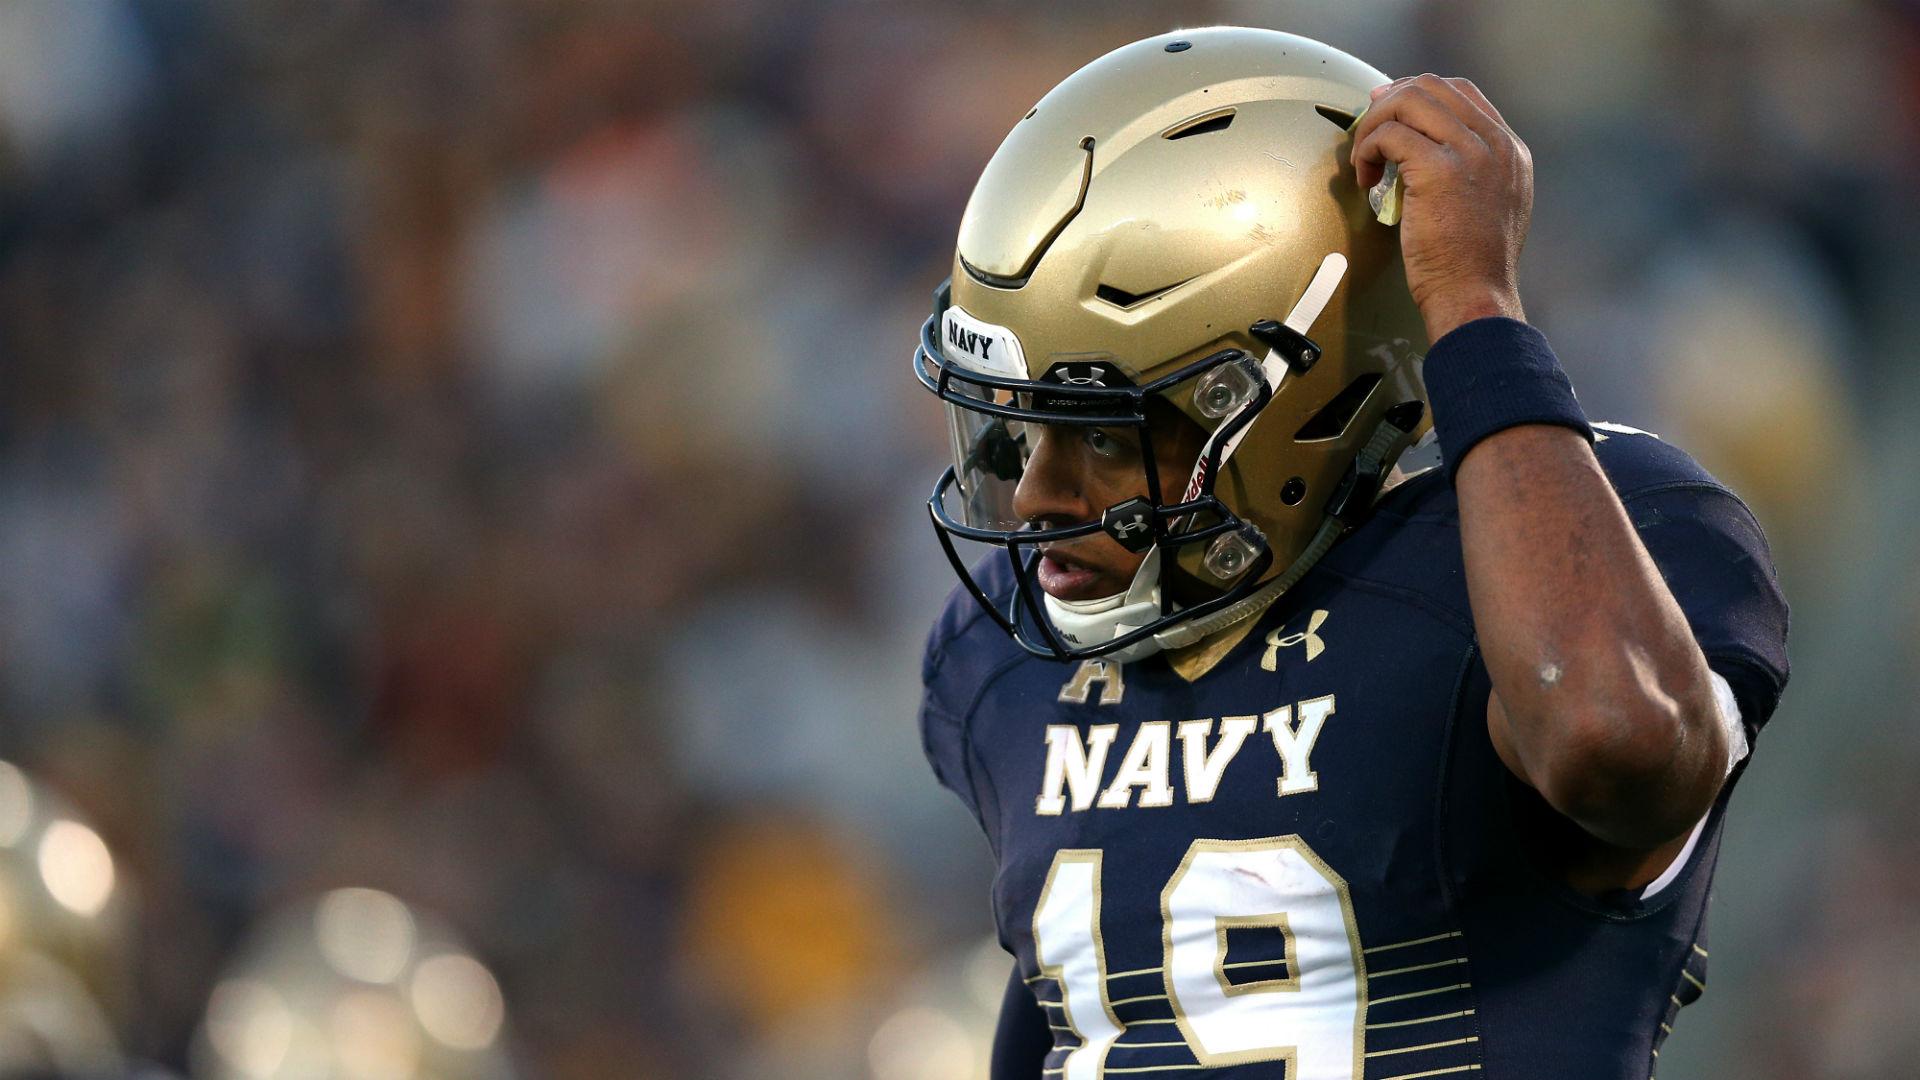 Seahawks sign former Navy quarterback Keenan Reynolds, report says